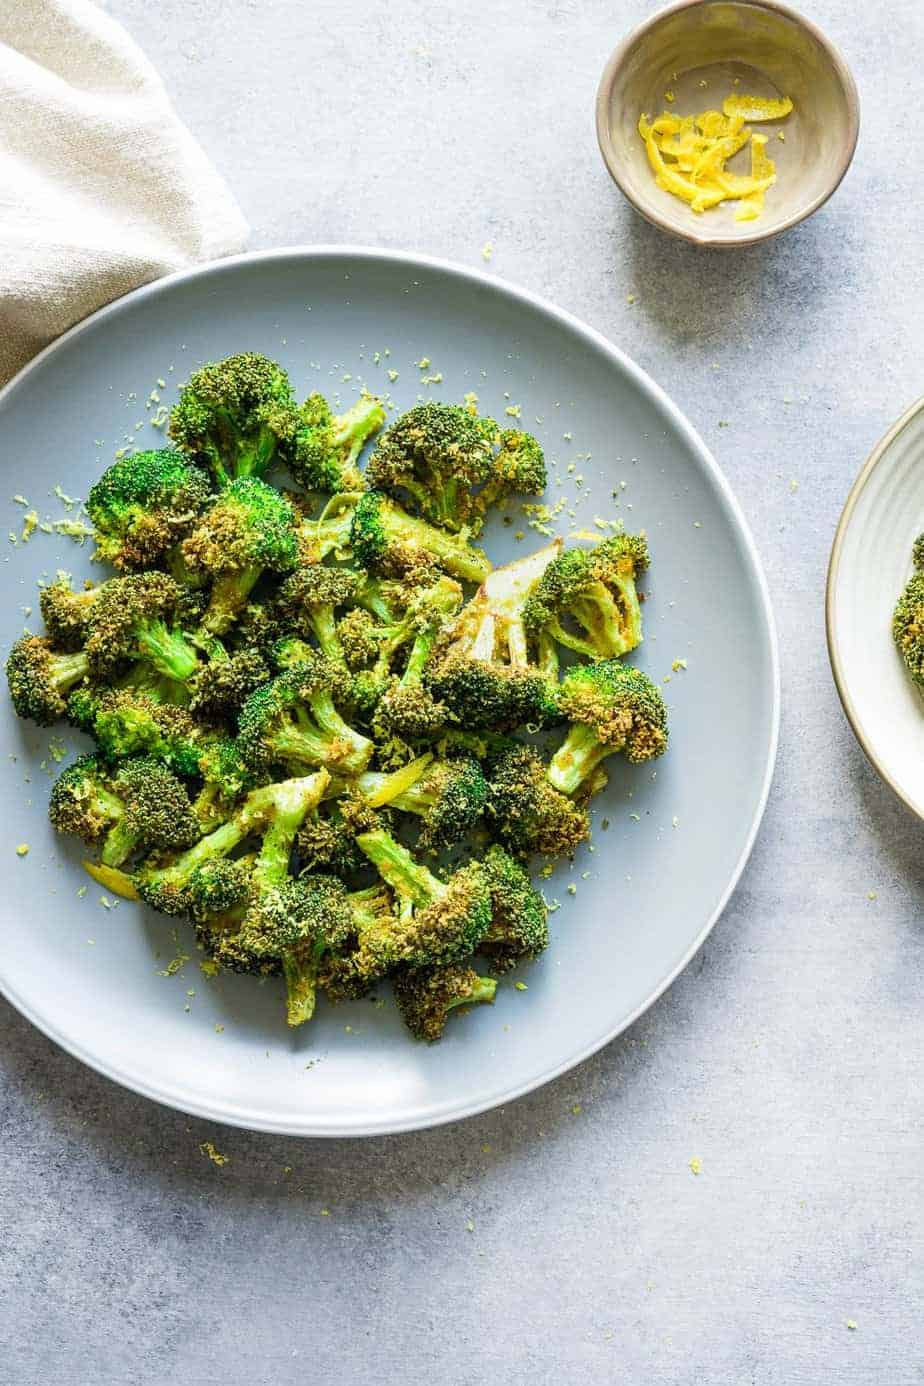 Crispy air fried broccoli sprinkle with lemon zest